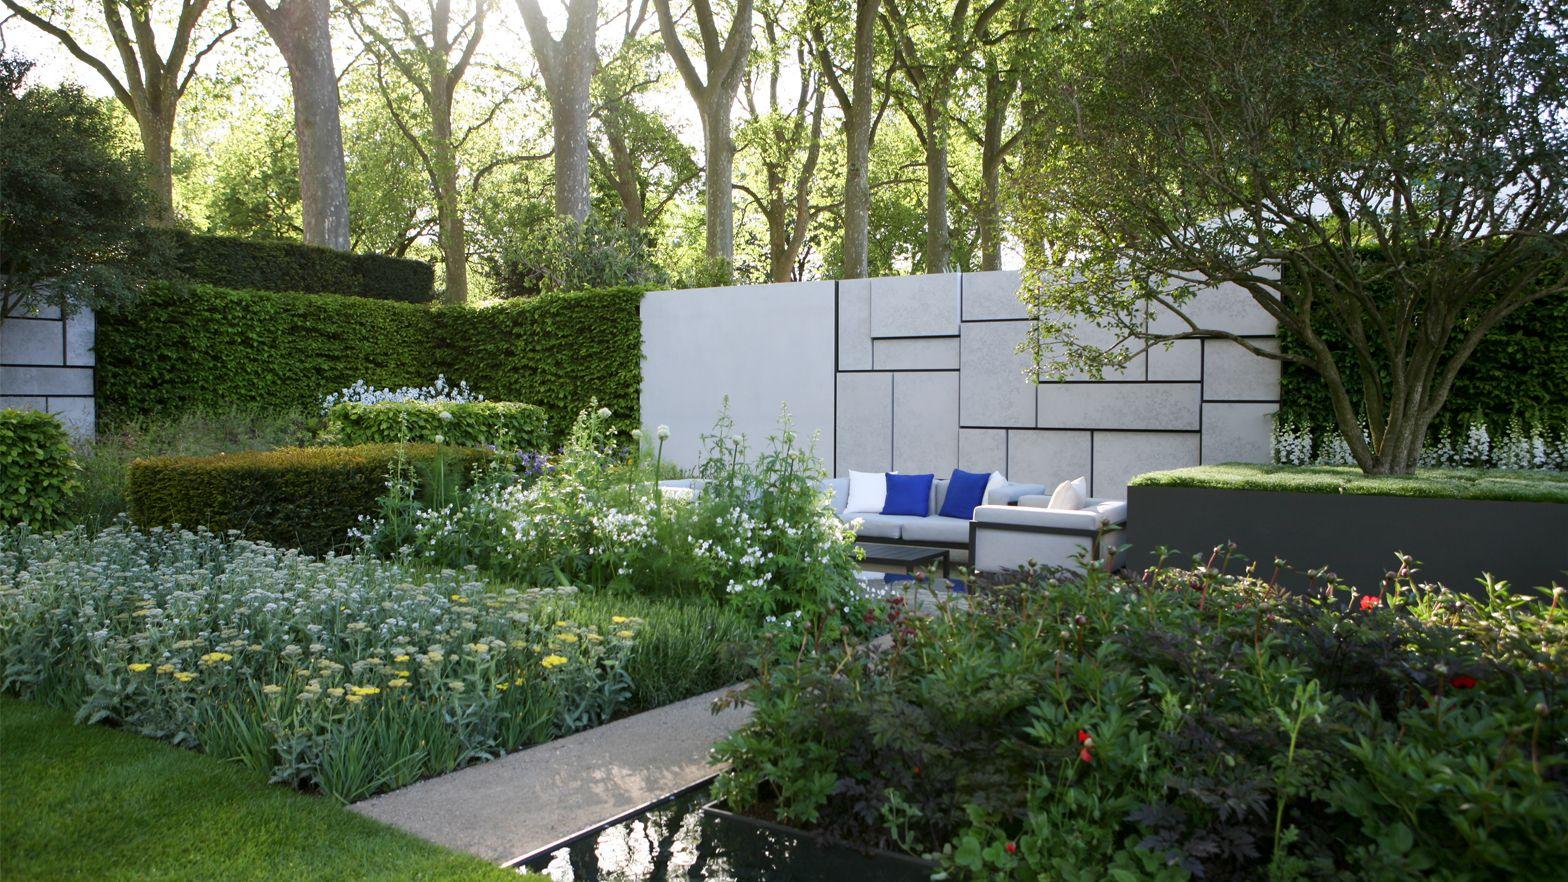 Chelsea Flower Show 2015 Garden Landscape Design Landscape Design Garden Design